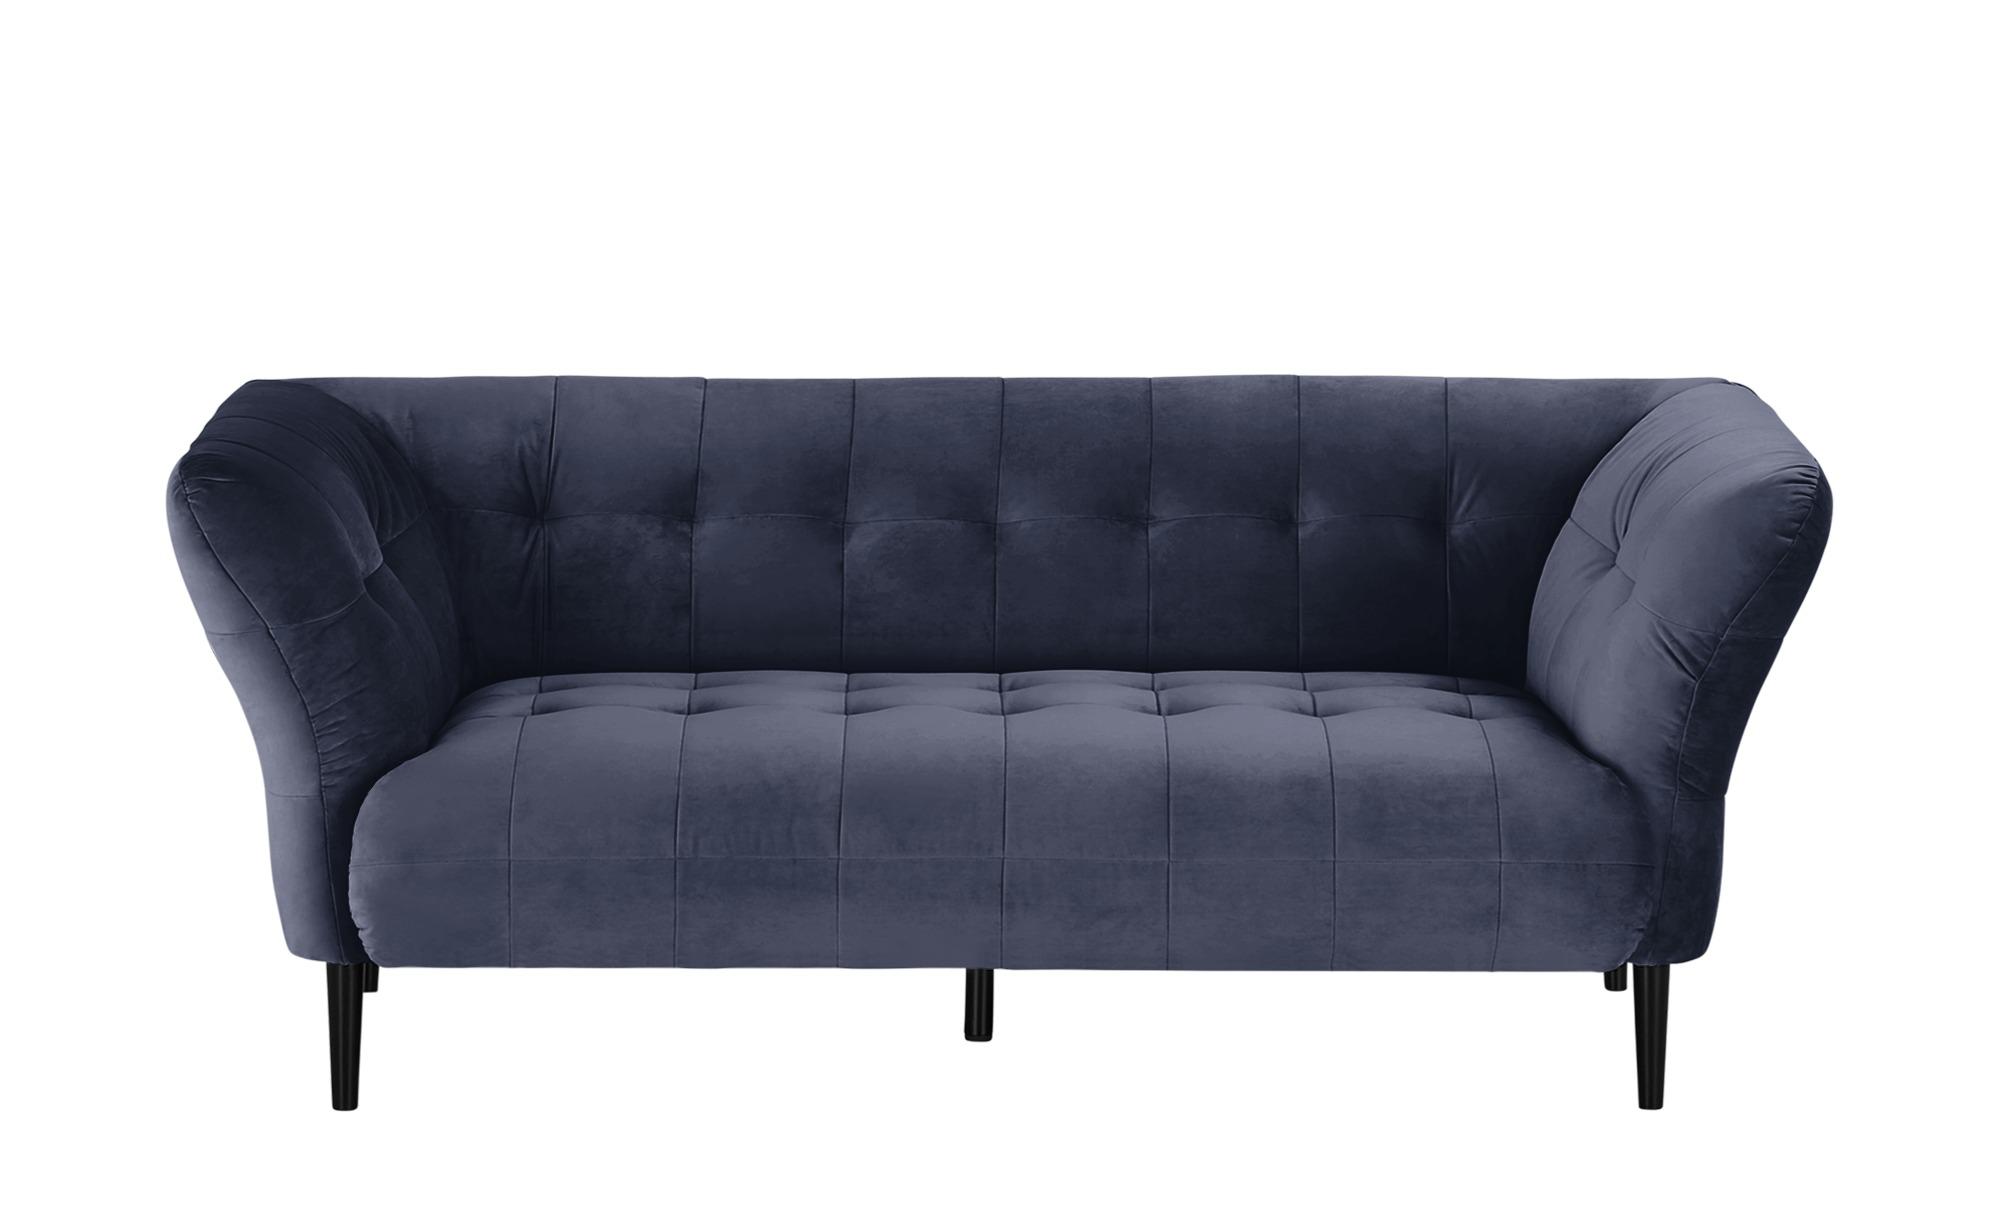 pop Sofa  Puccini ¦ blau ¦ Maße (cm): B: 200 H: 79 T: 97 Polstermöbel > Sofas > 2-Sitzer - Höffner